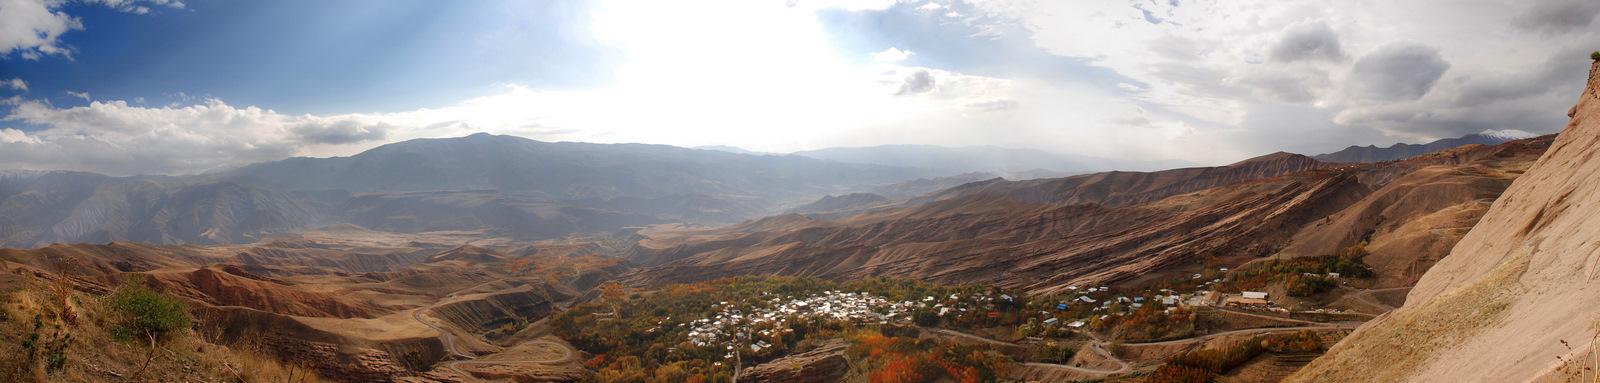 Iran - Alamoot Castle